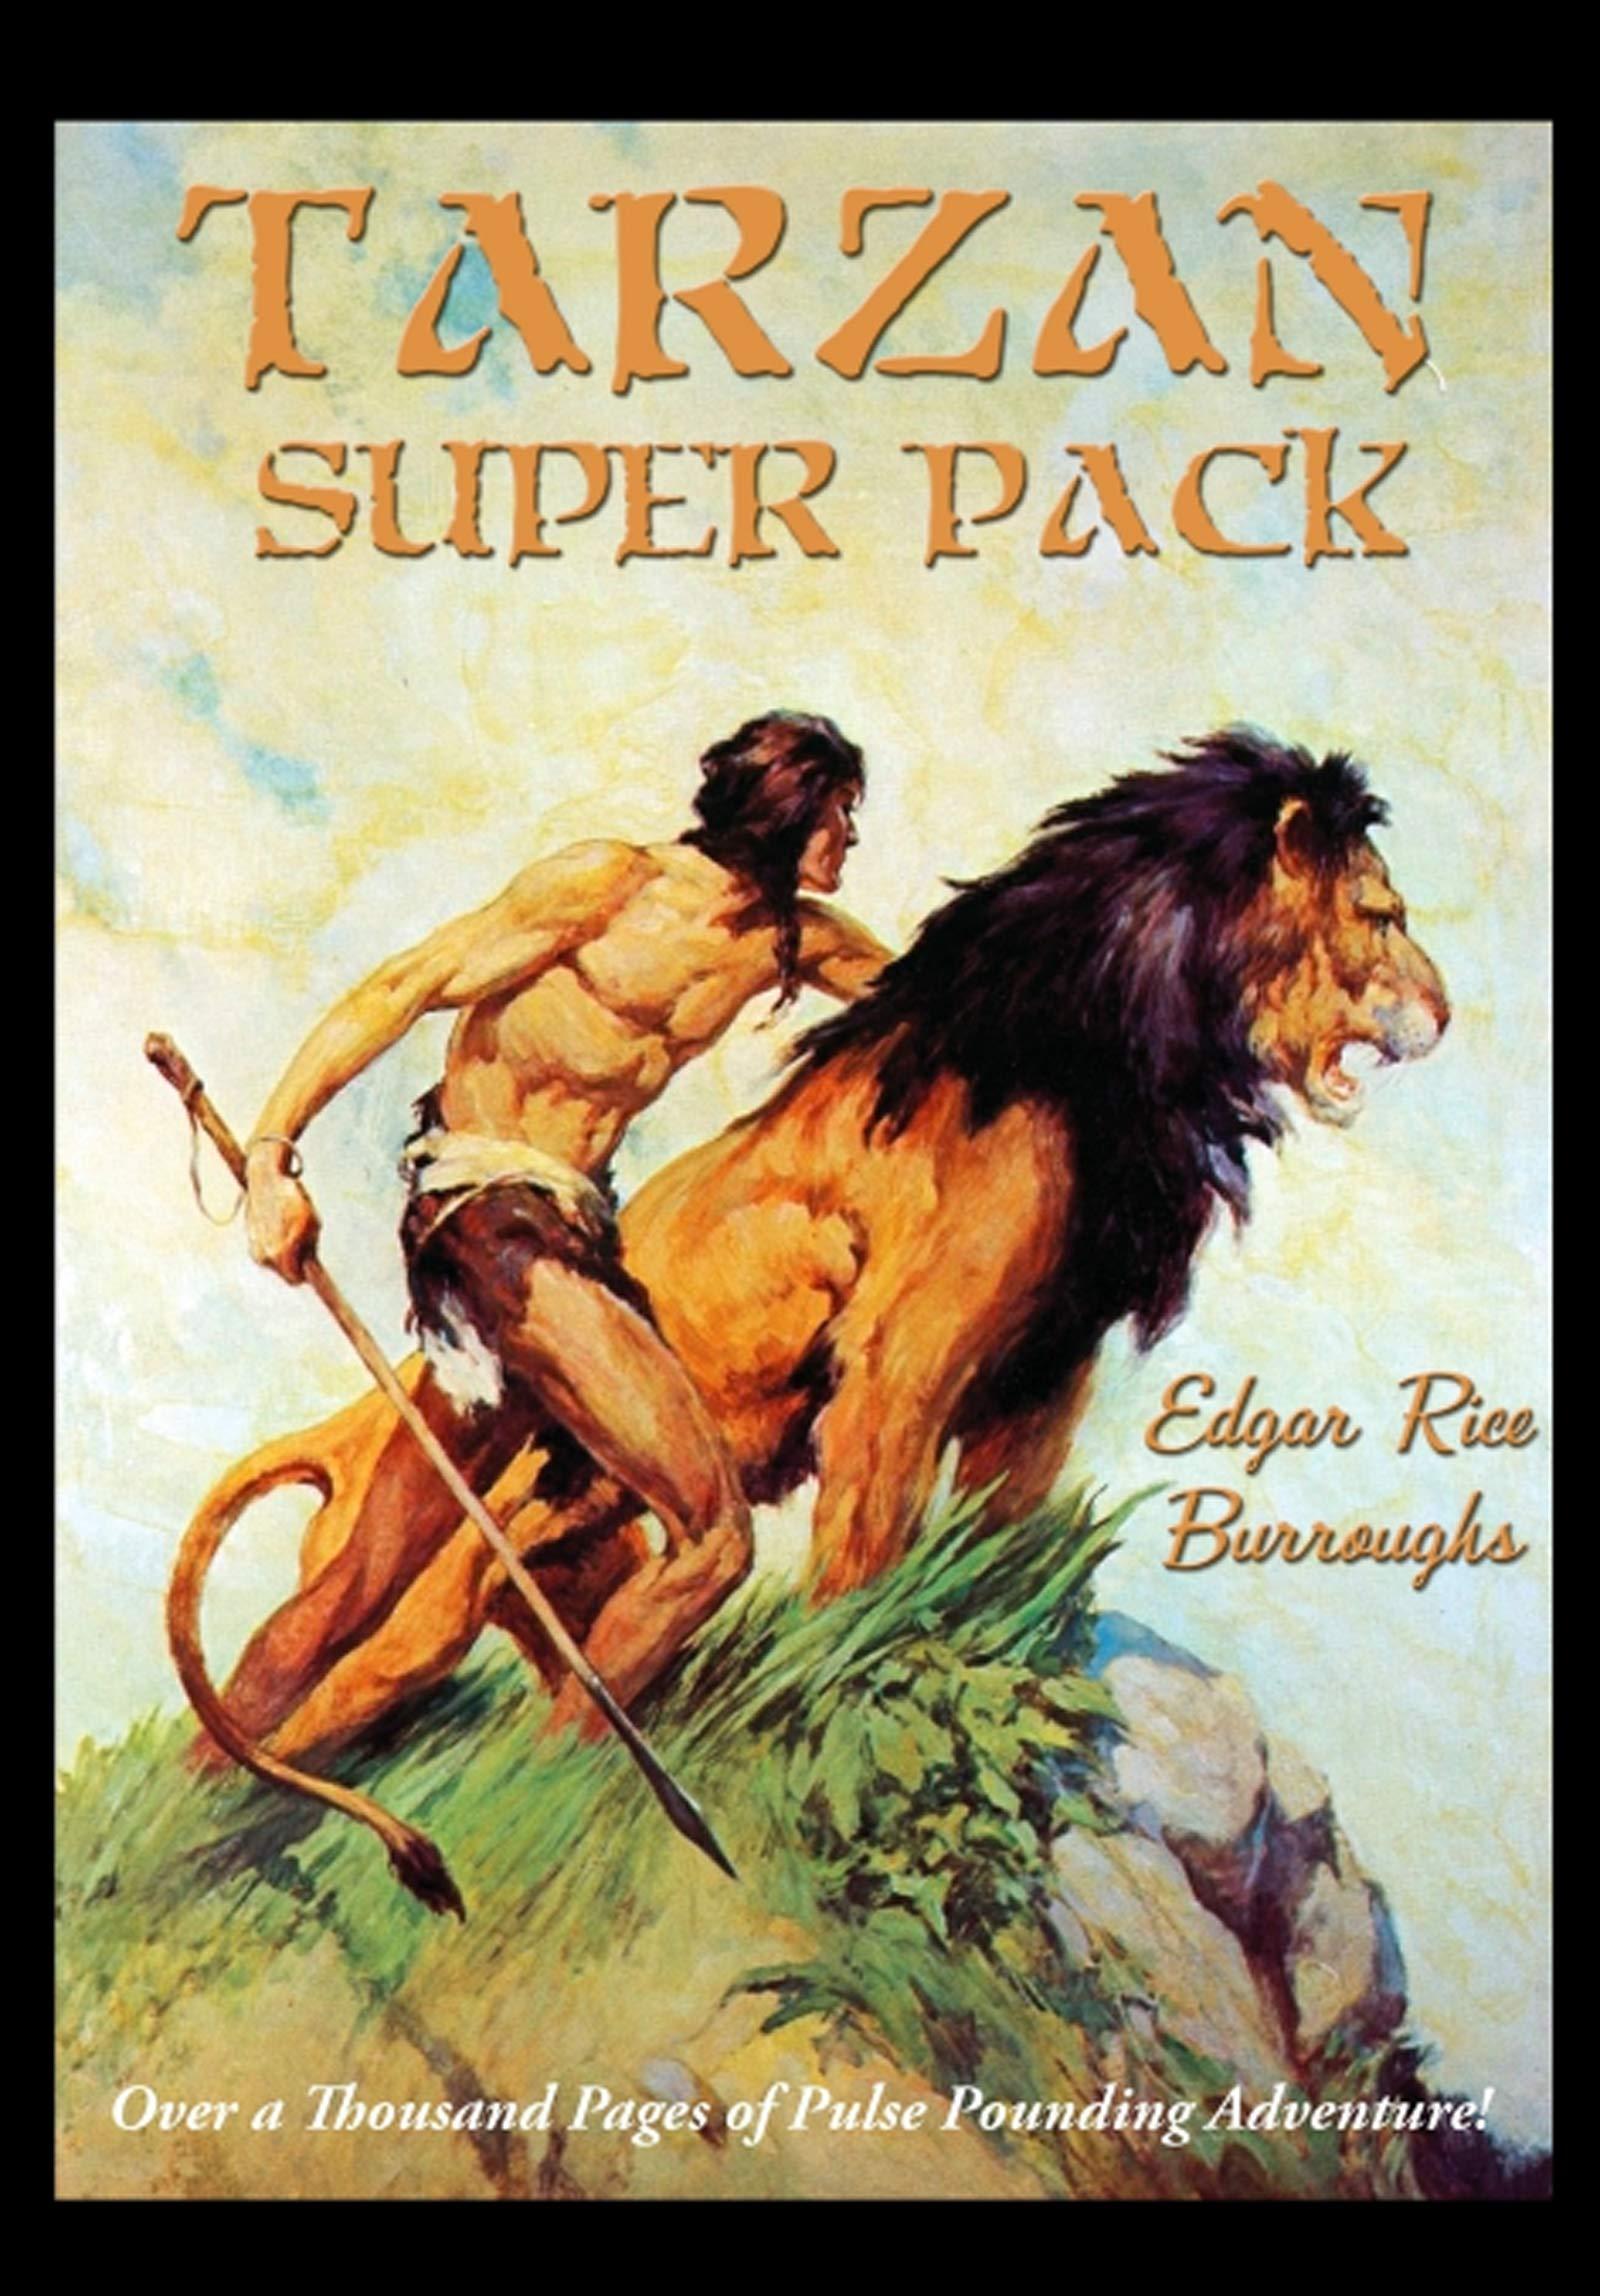 Tarzan Super Pack: Tarzan of the Apes, The Return Of Tarzan, The Beasts of Tarzan, The Son of Tarzan, Tarzan and the Jewels of Opar, Jungle Tales of Tarzan, ... (Positronic Super Pack Series Book 40)